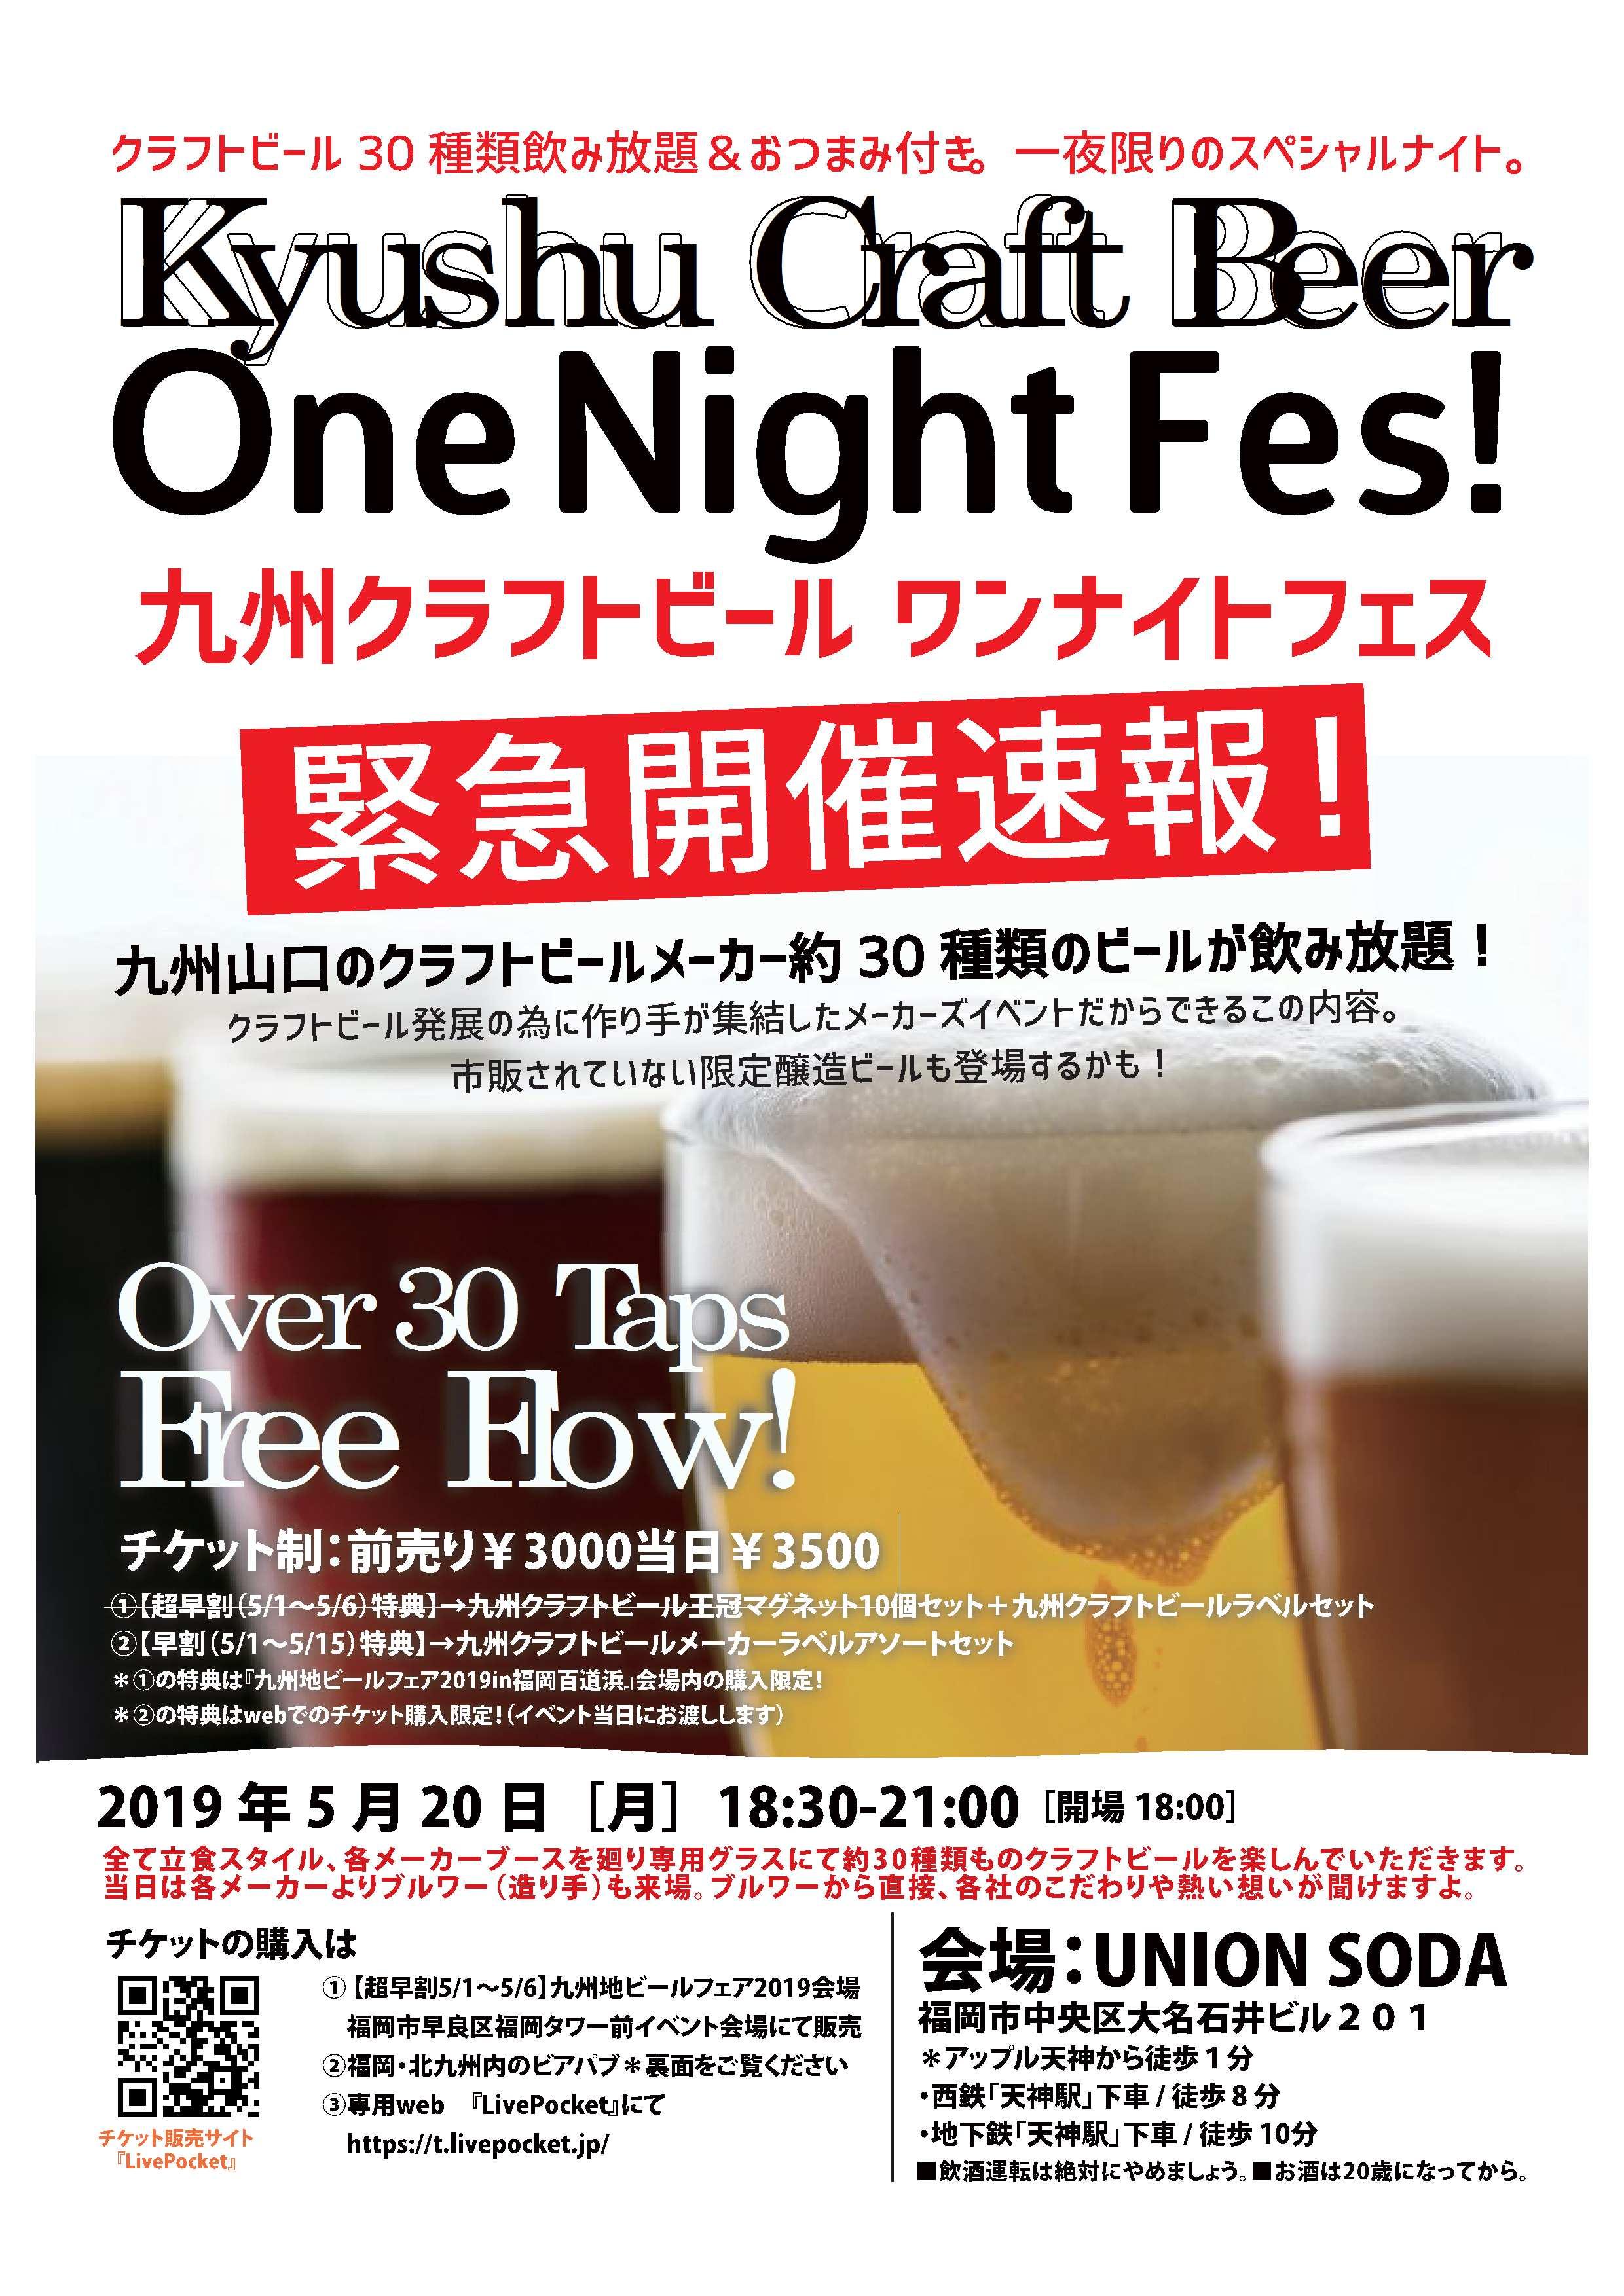 Kyushu Craft Beer One Night Fes!